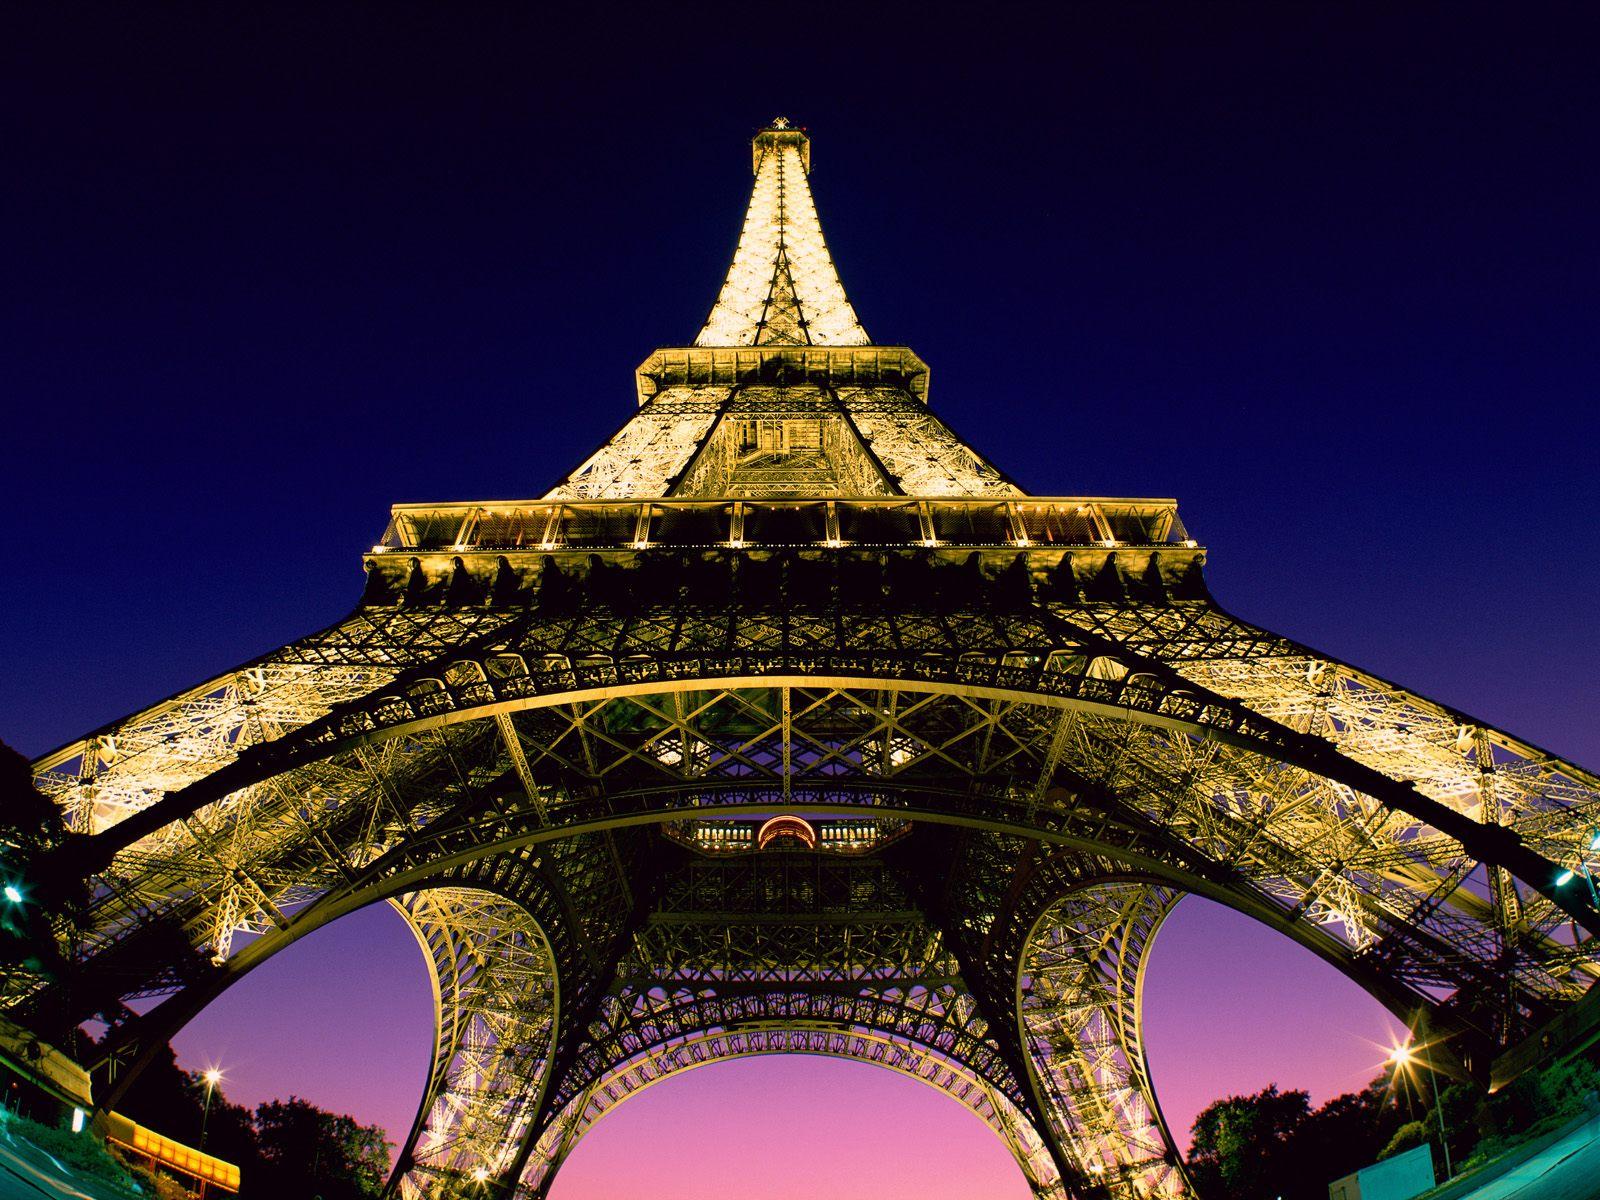 http://2.bp.blogspot.com/-W6sbsKpZ1rE/TwCyu9FC3uI/AAAAAAAAAxQ/58taVE1gSqc/s1600/eiffel_tower%252C_paris%252C_france.jpg